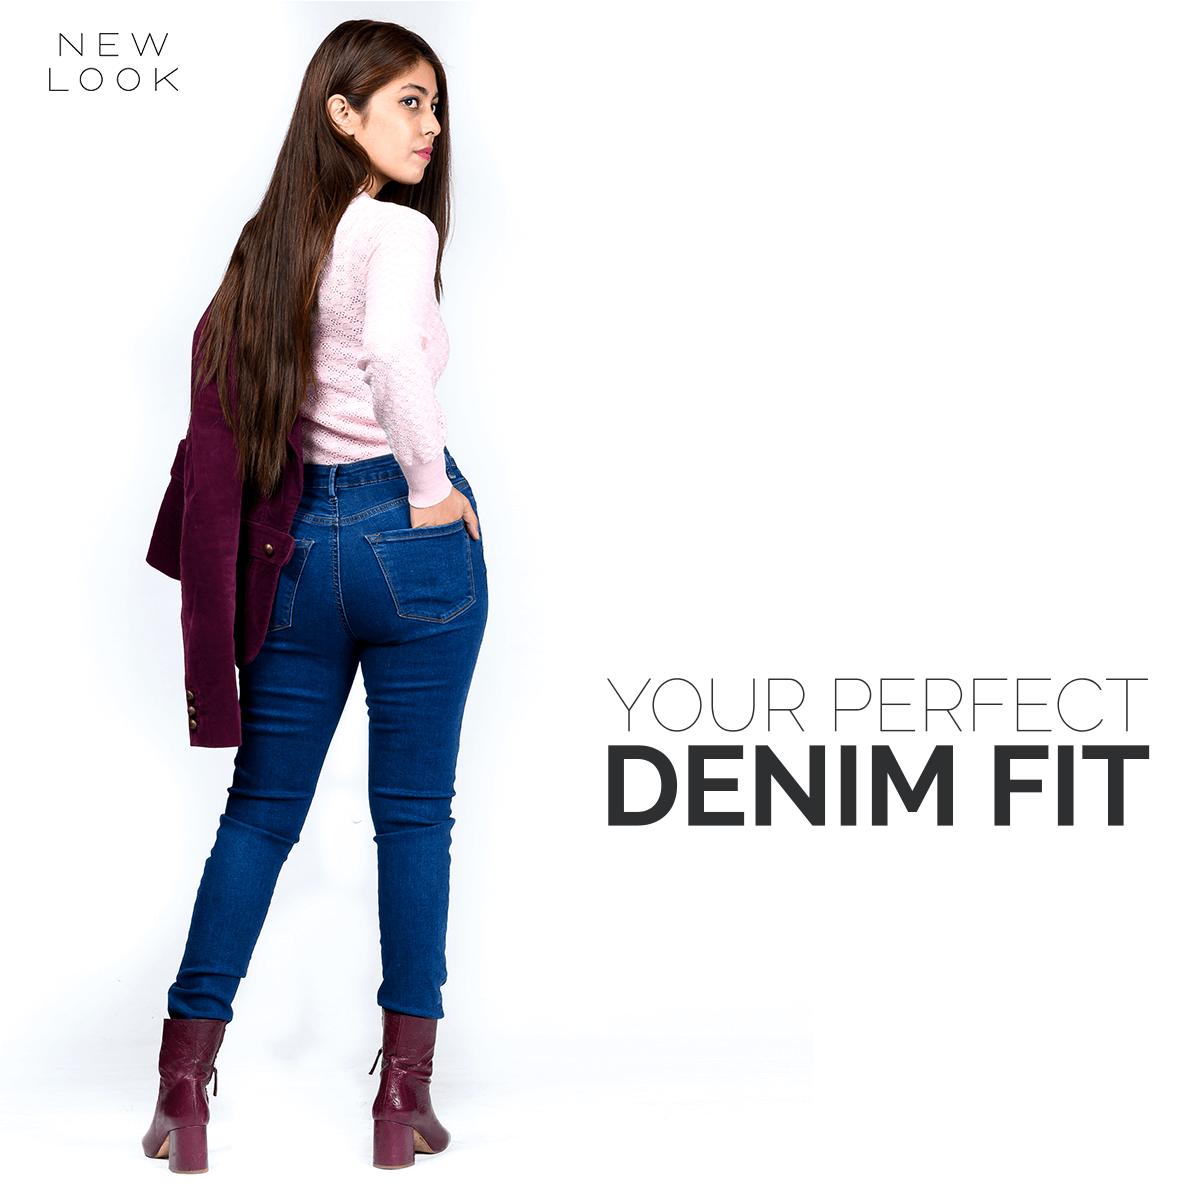 New Look Women Jenna Jeans Help Make You Look Marvelous